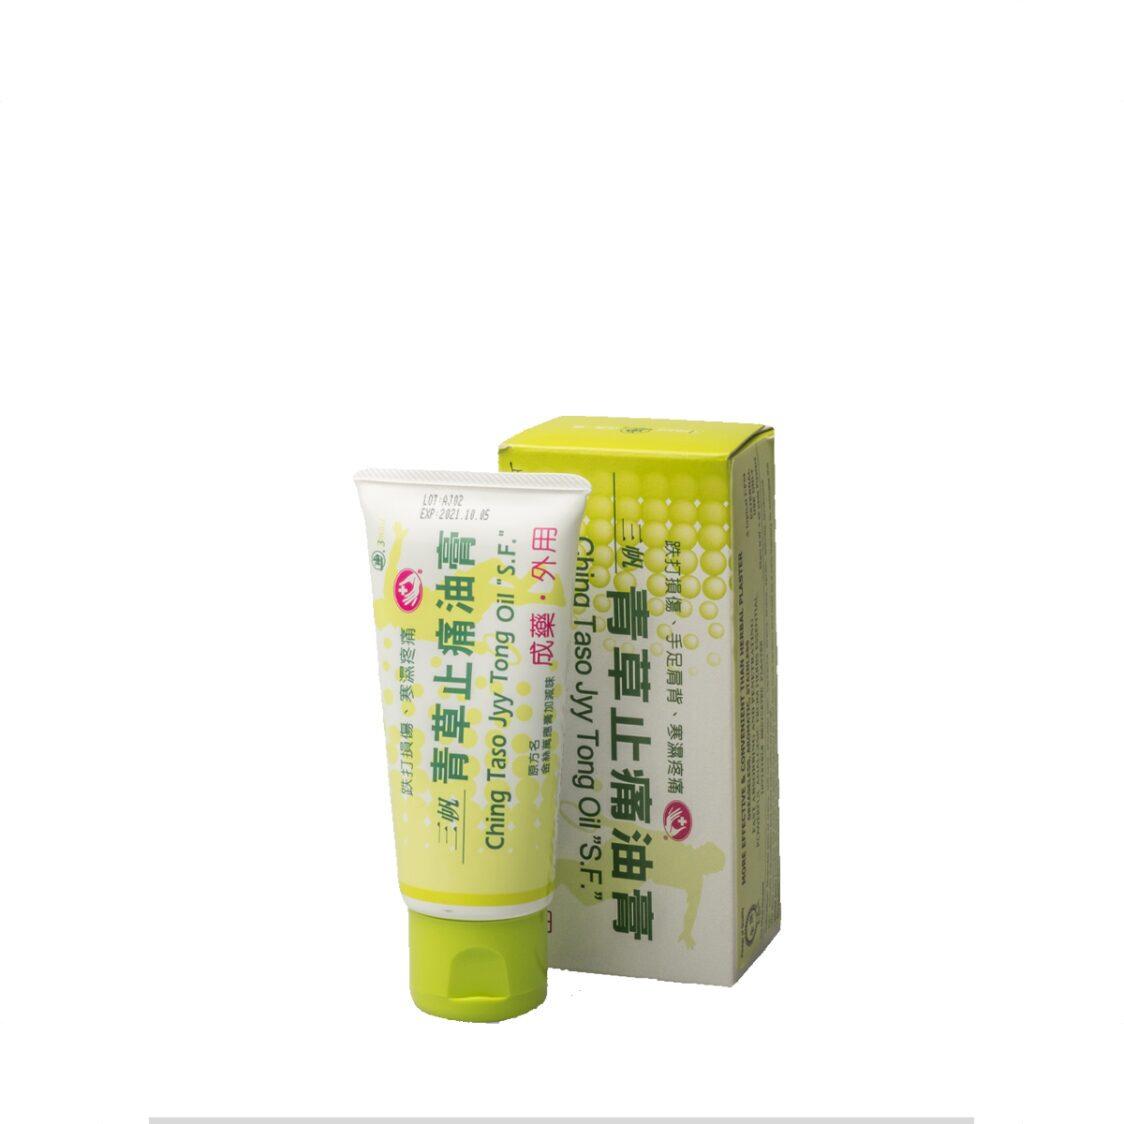 Winlykah TCM SF Brand Ching Taso Jyy Tong Oil